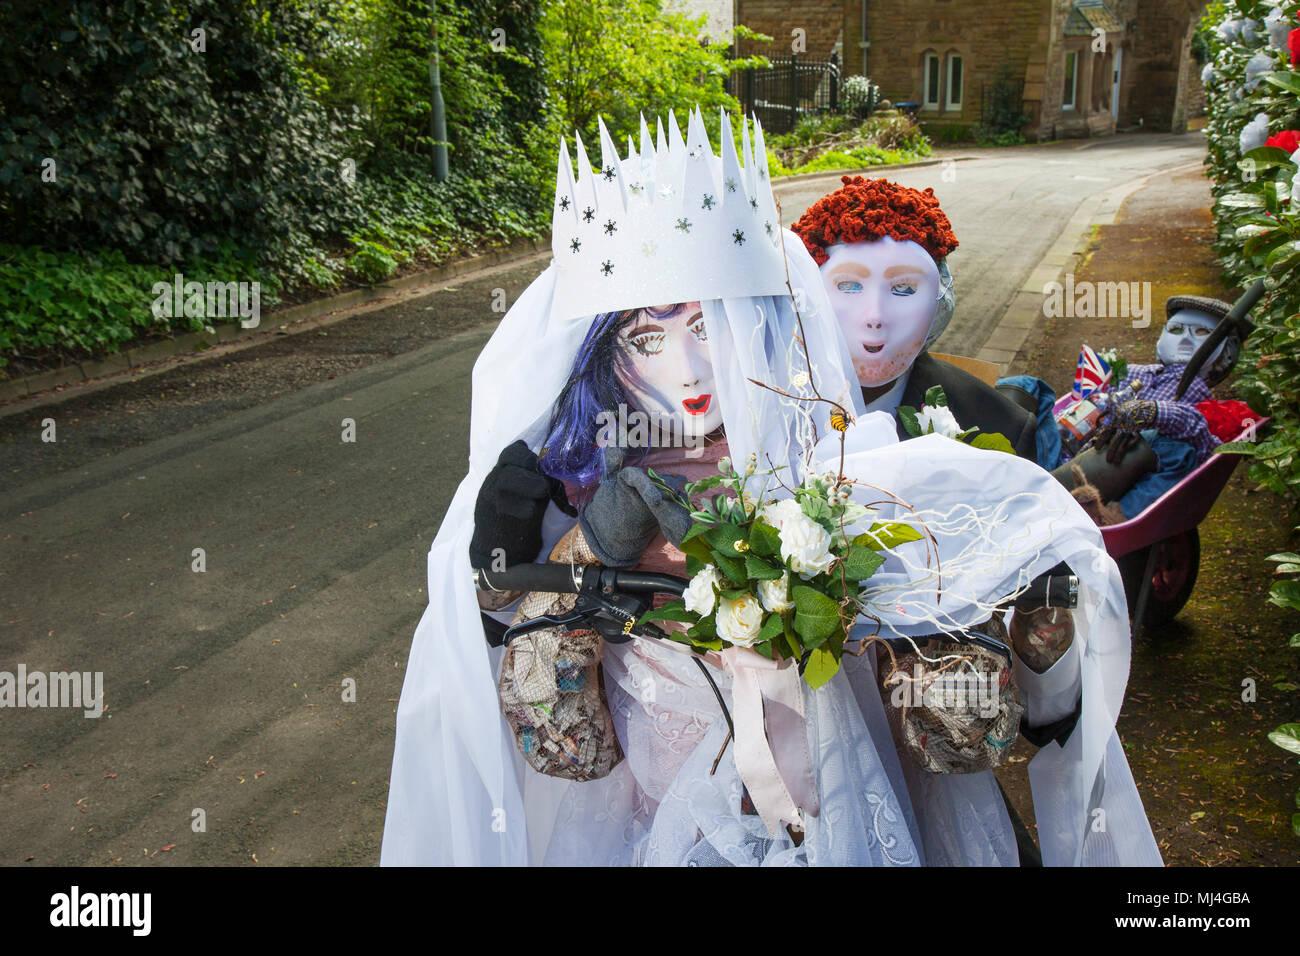 Married affairs uk